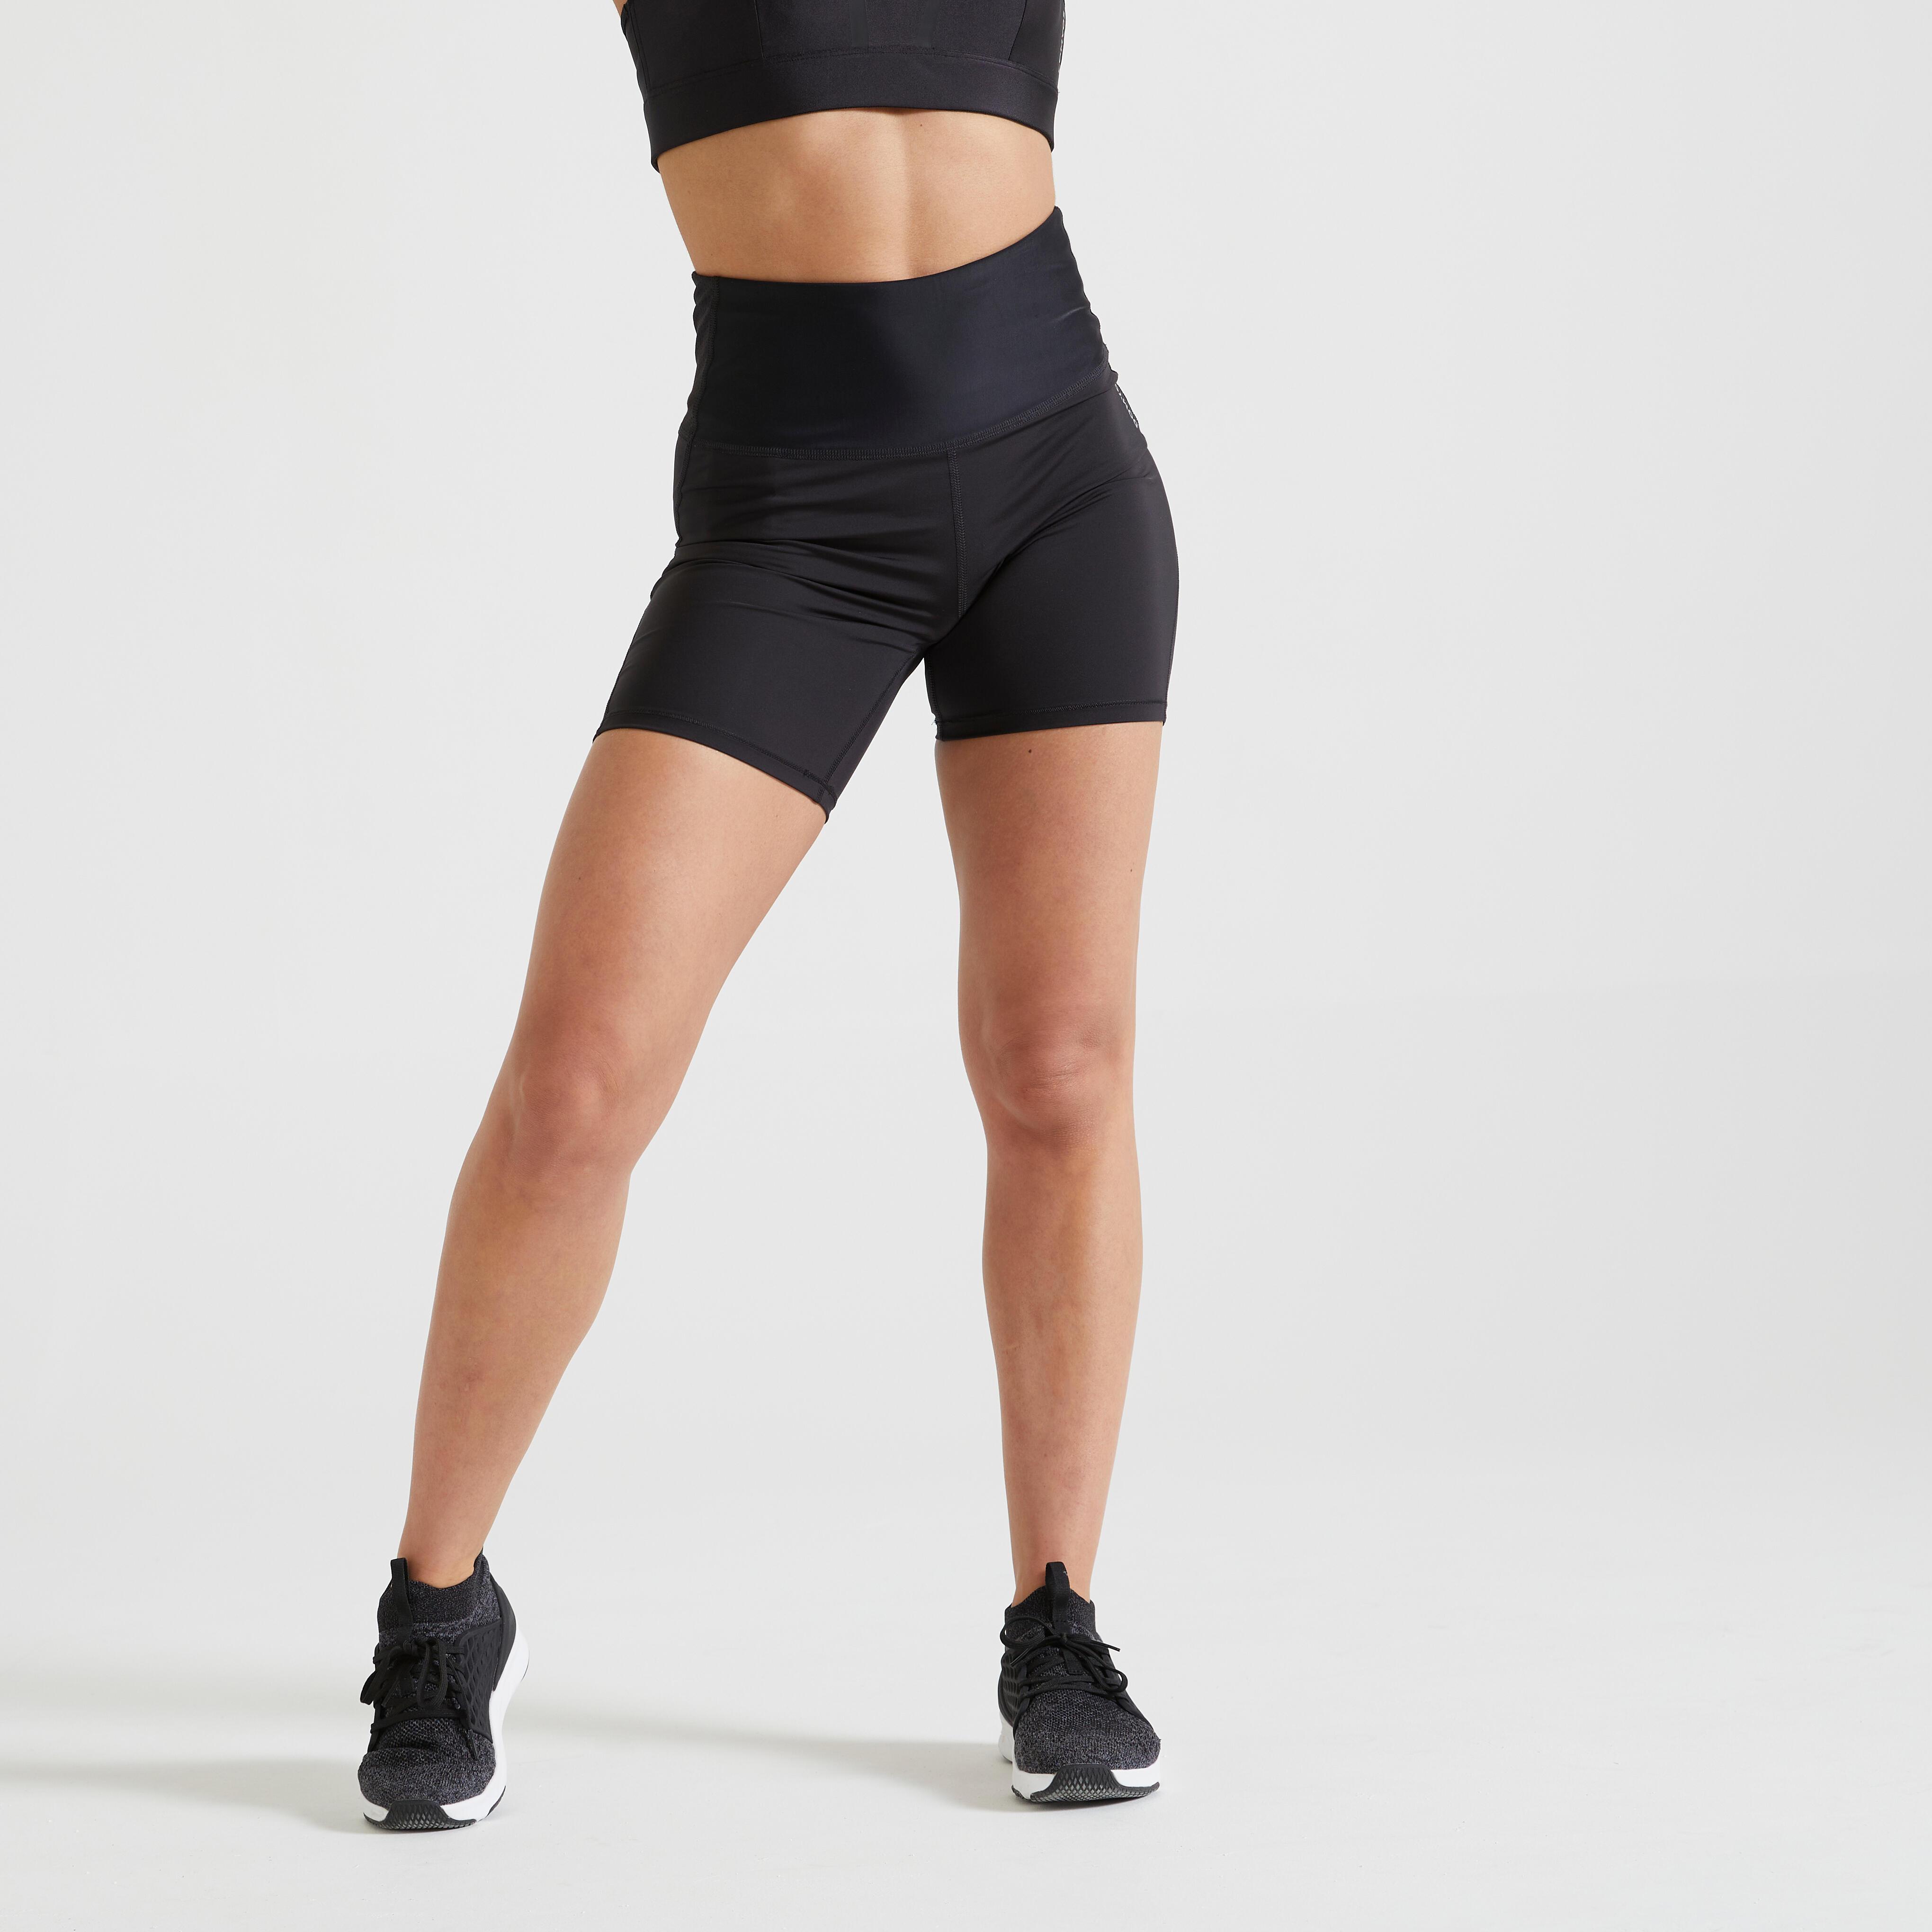 Șort Fitness 500 Negru